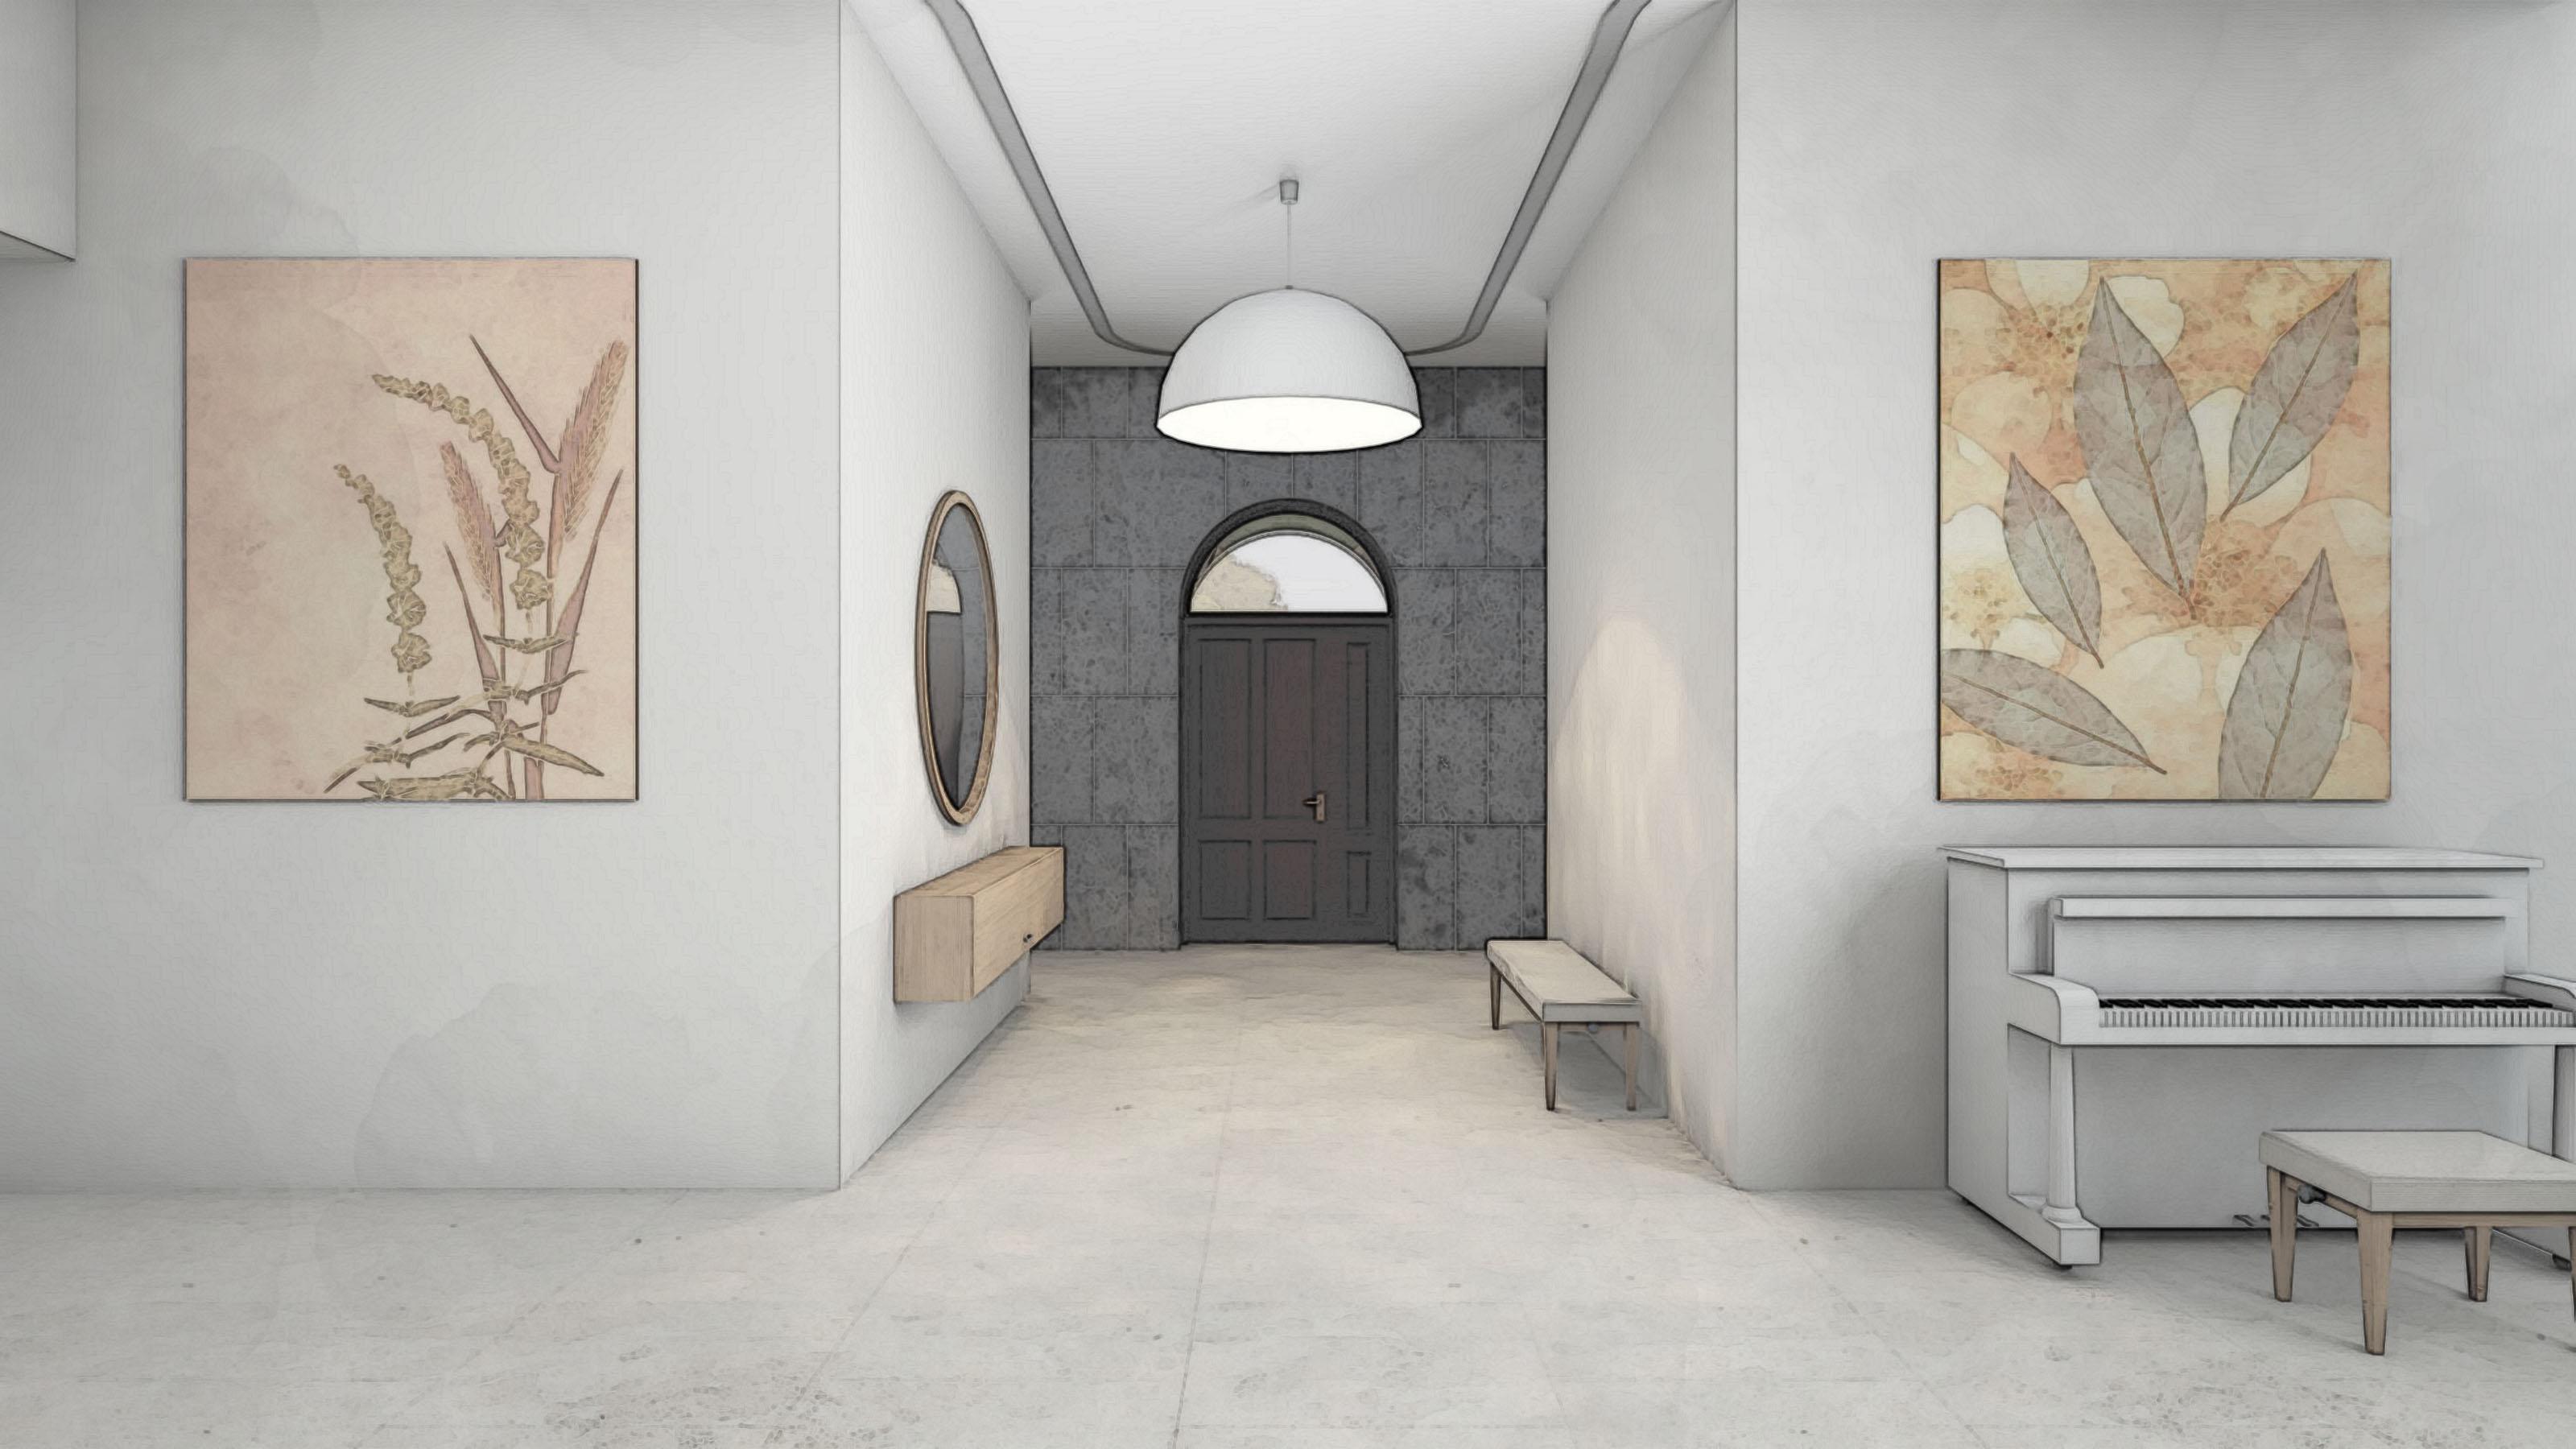 Изображение для проекта Проект особняка в Латвии в стиле модерн 2898